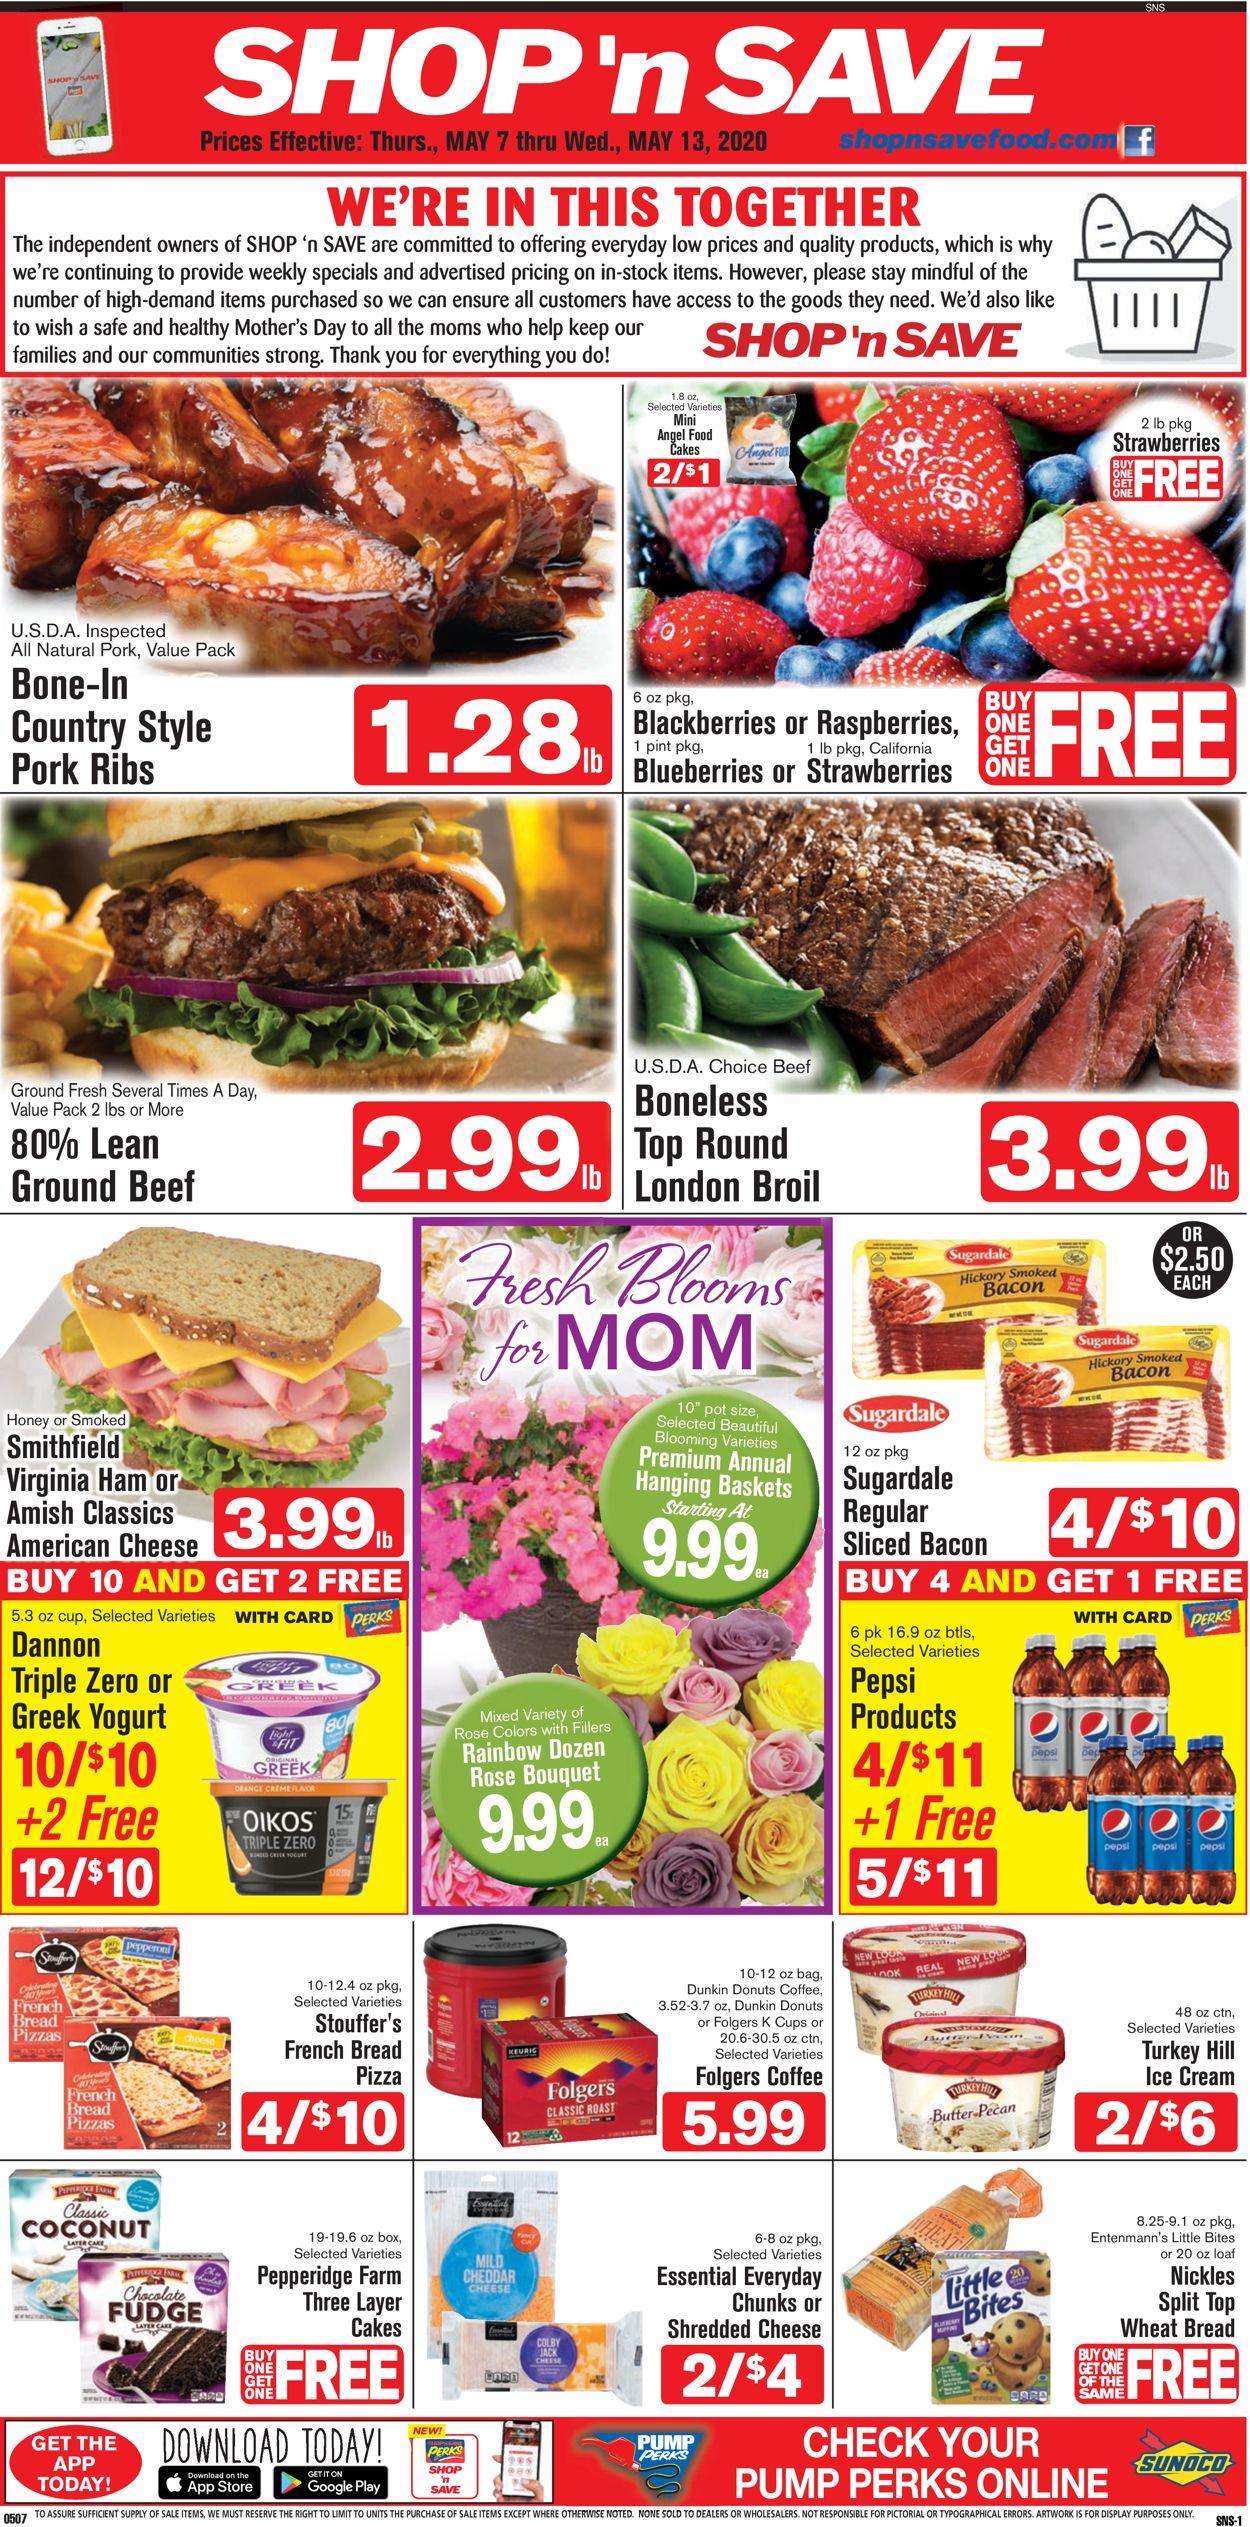 Shop 'n Save (Pittsburgh) Weekly Ad Circular - valid 05/07-05/13/2020